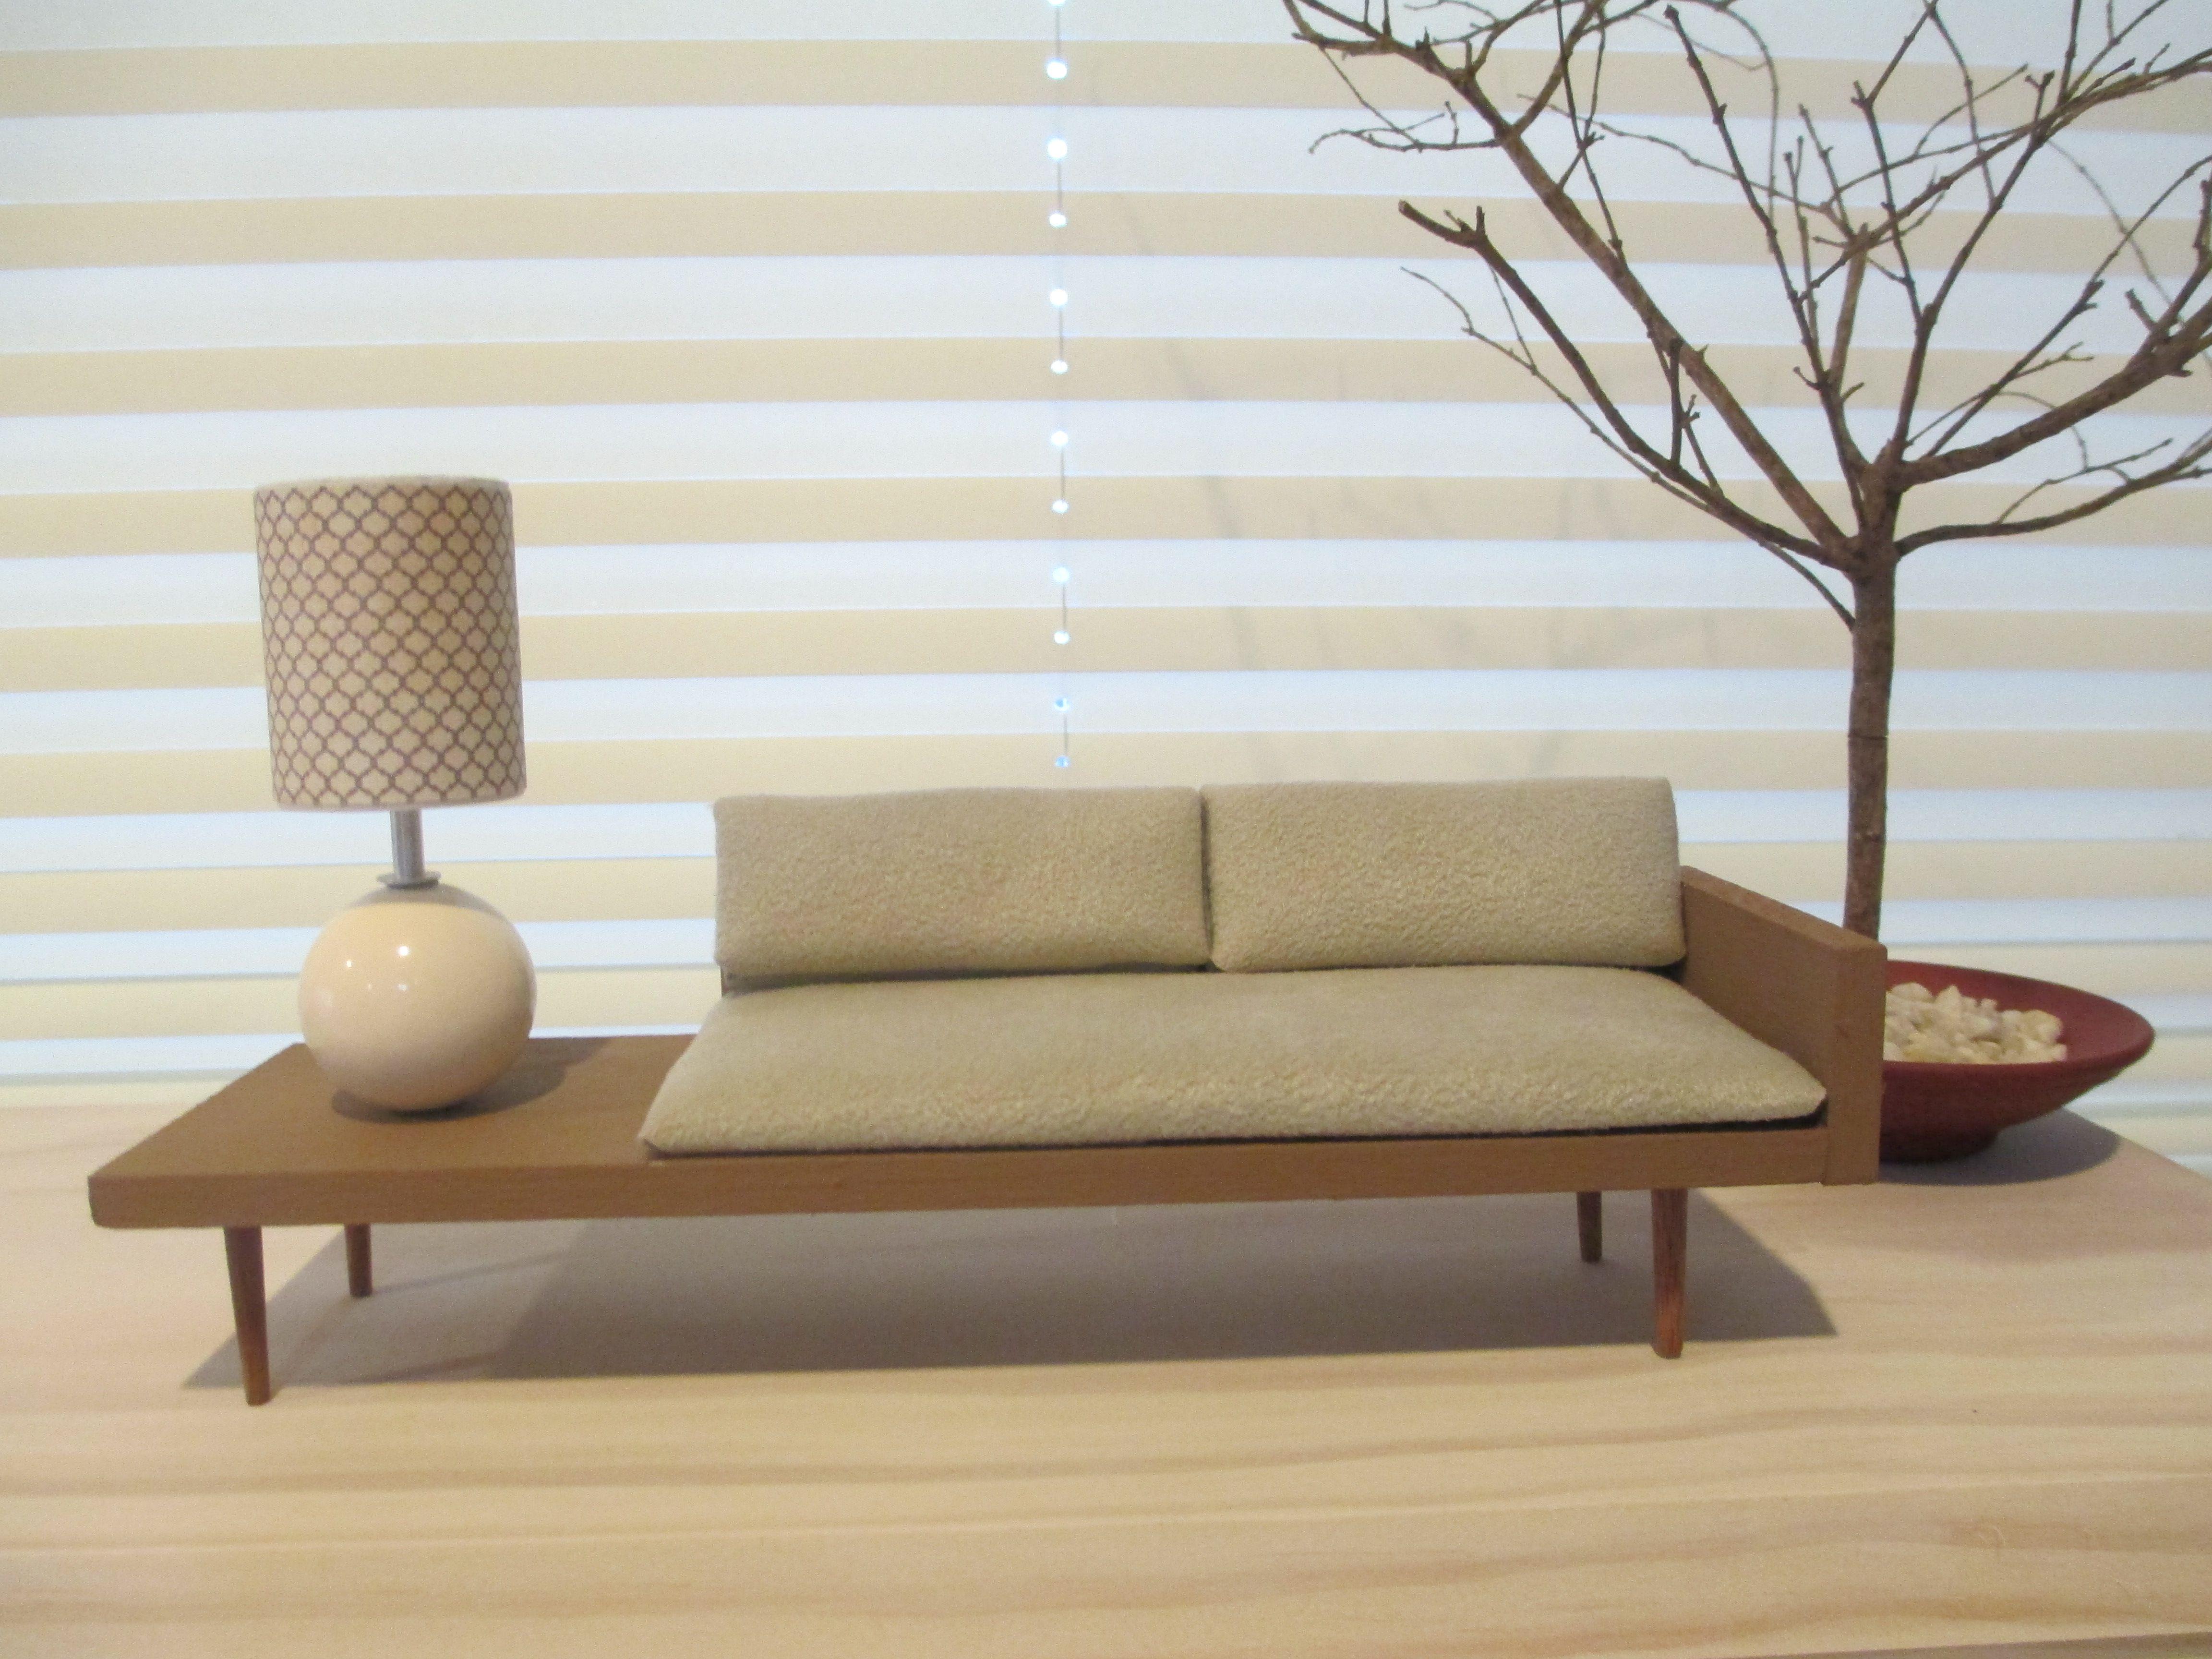 Miniature Mid Century Modern Sofa de by me